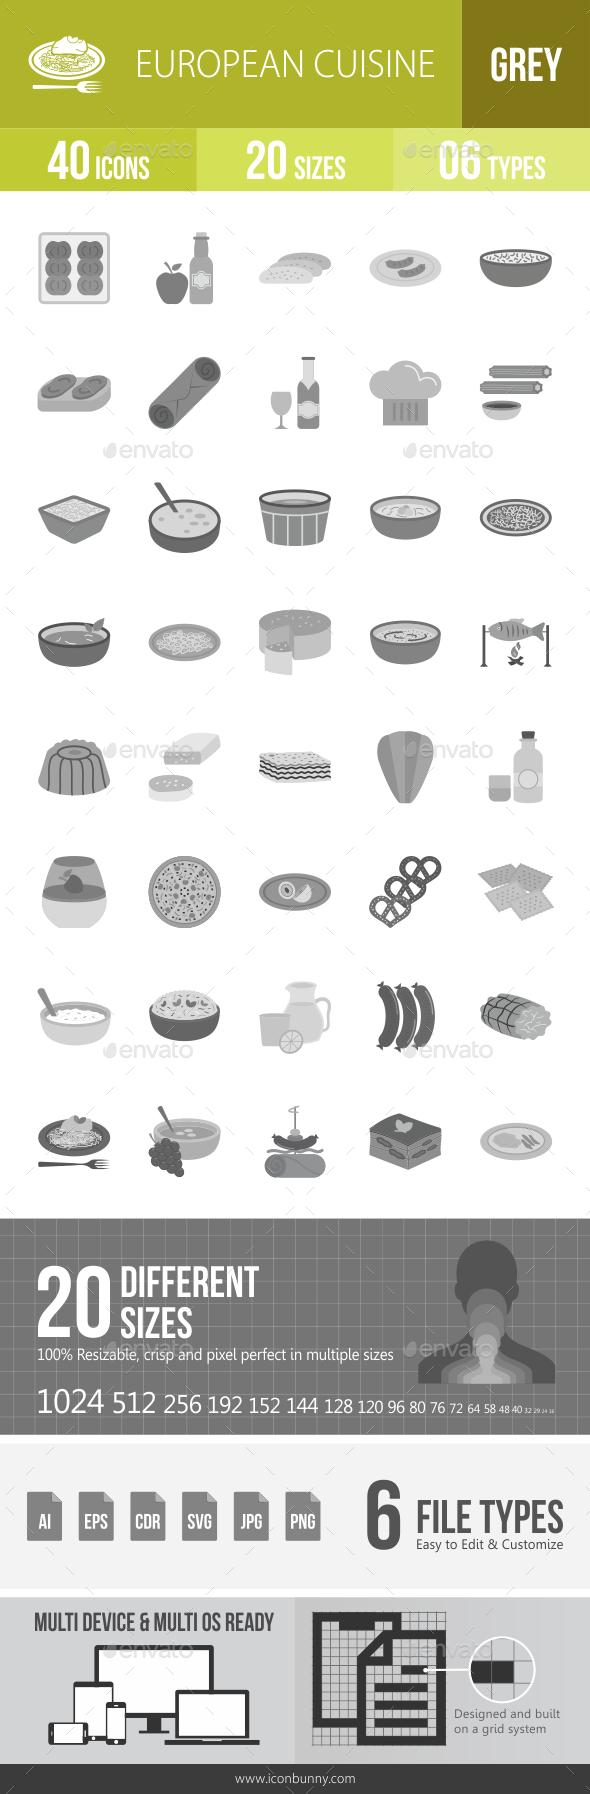 European Cuisine Greyscale Icons - Icons